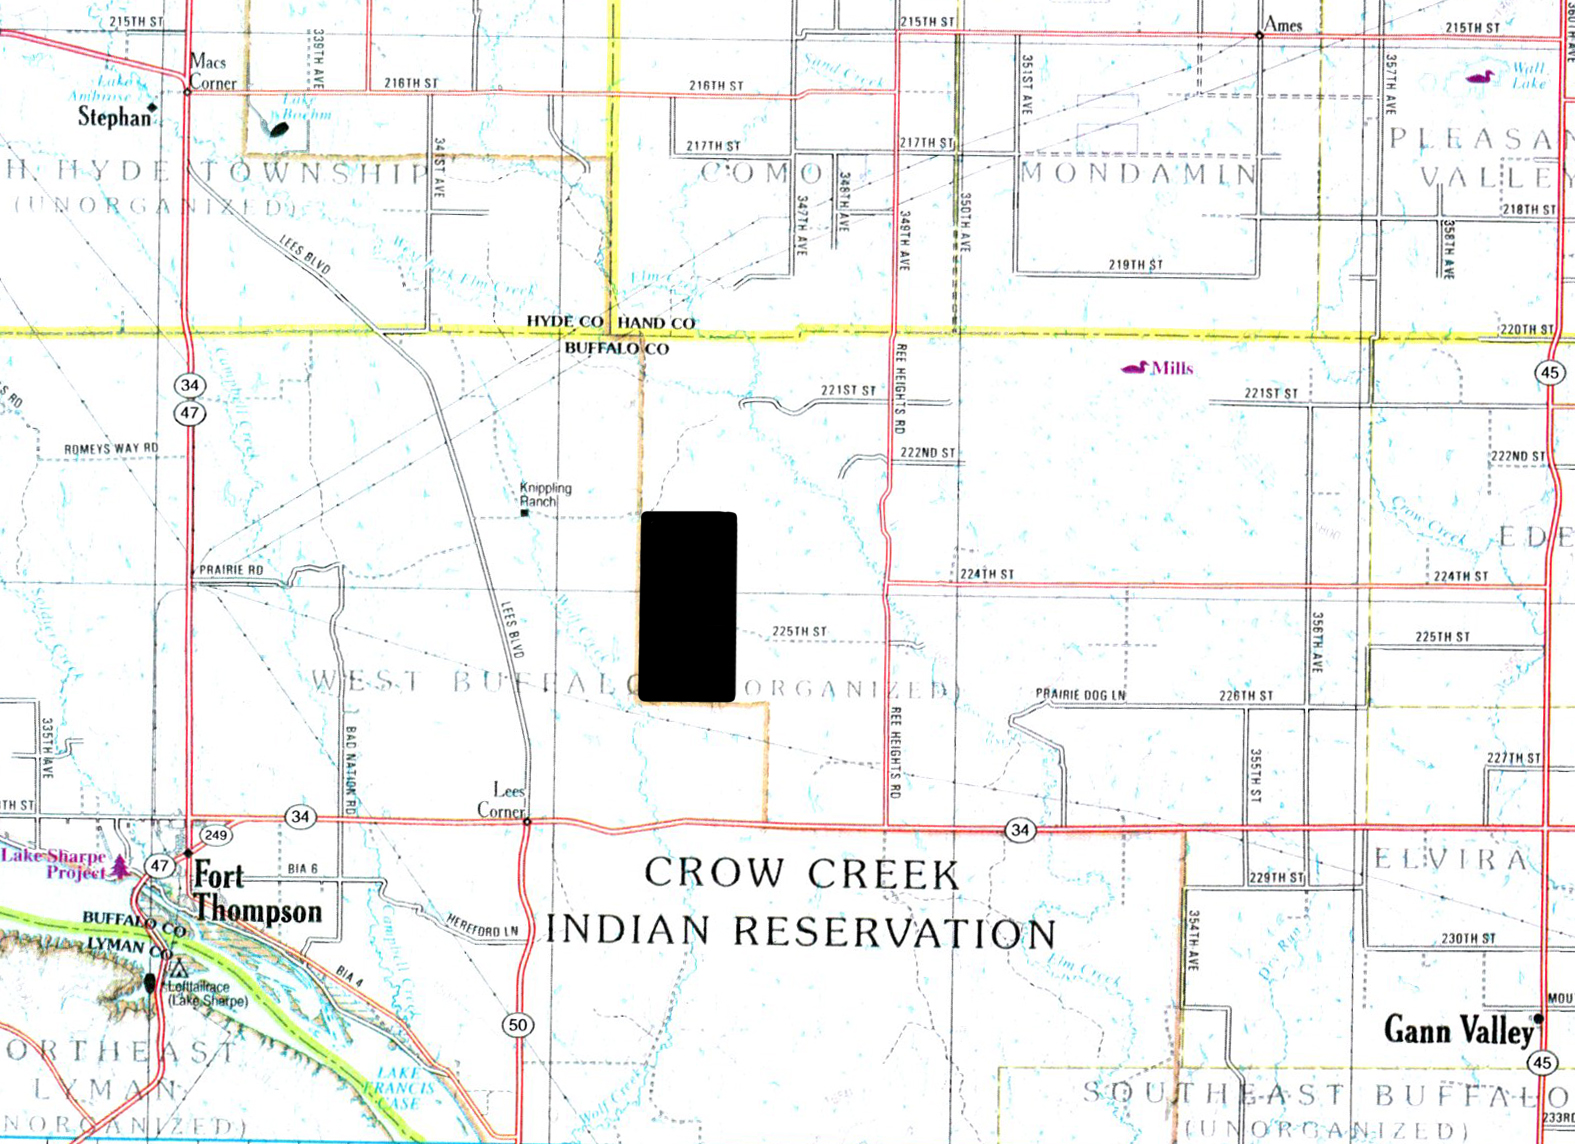 Land Location Buffalo-BIR1051